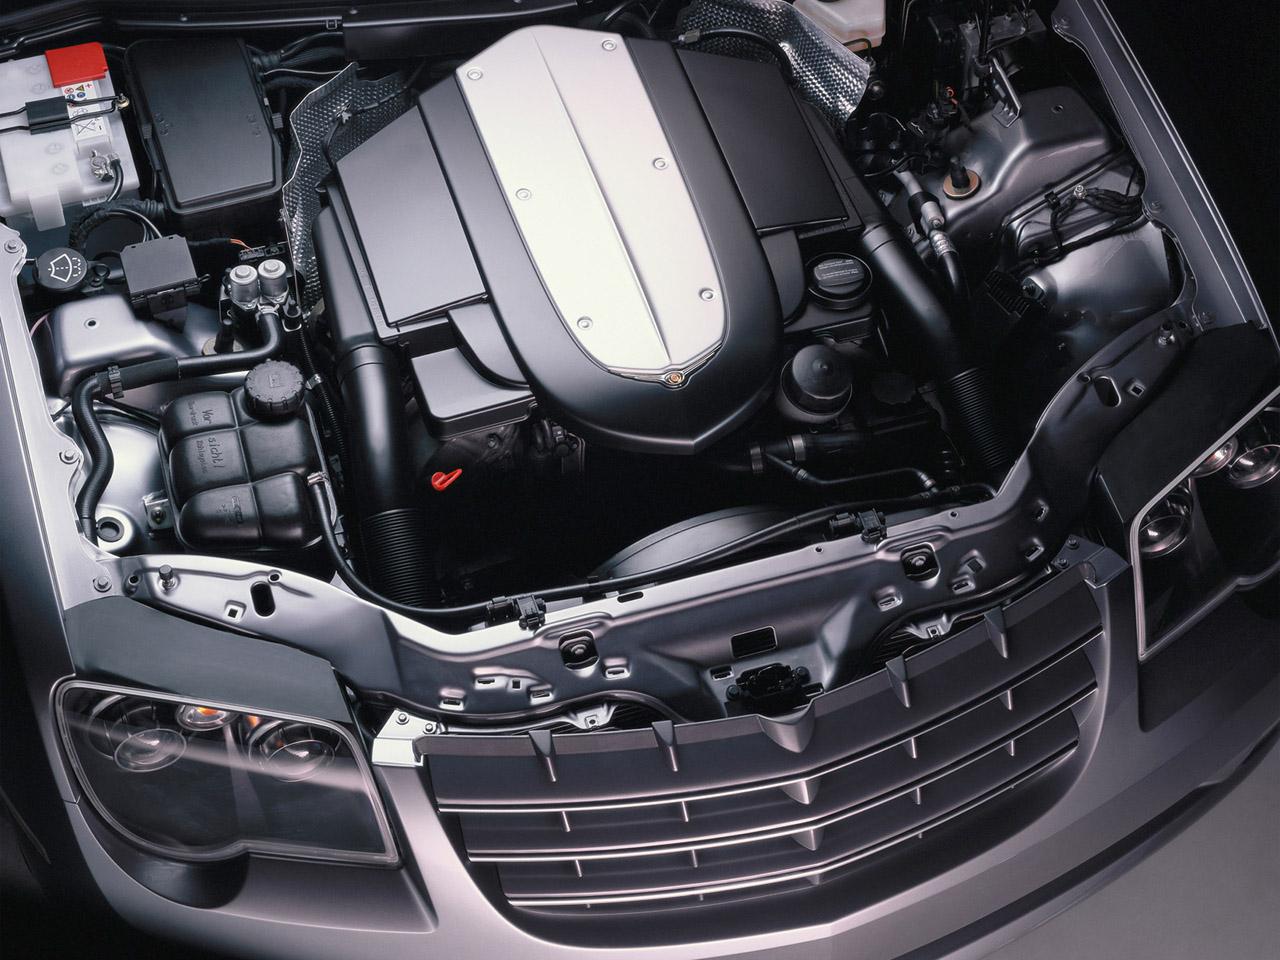 2005 Chrysler Crossfire engine